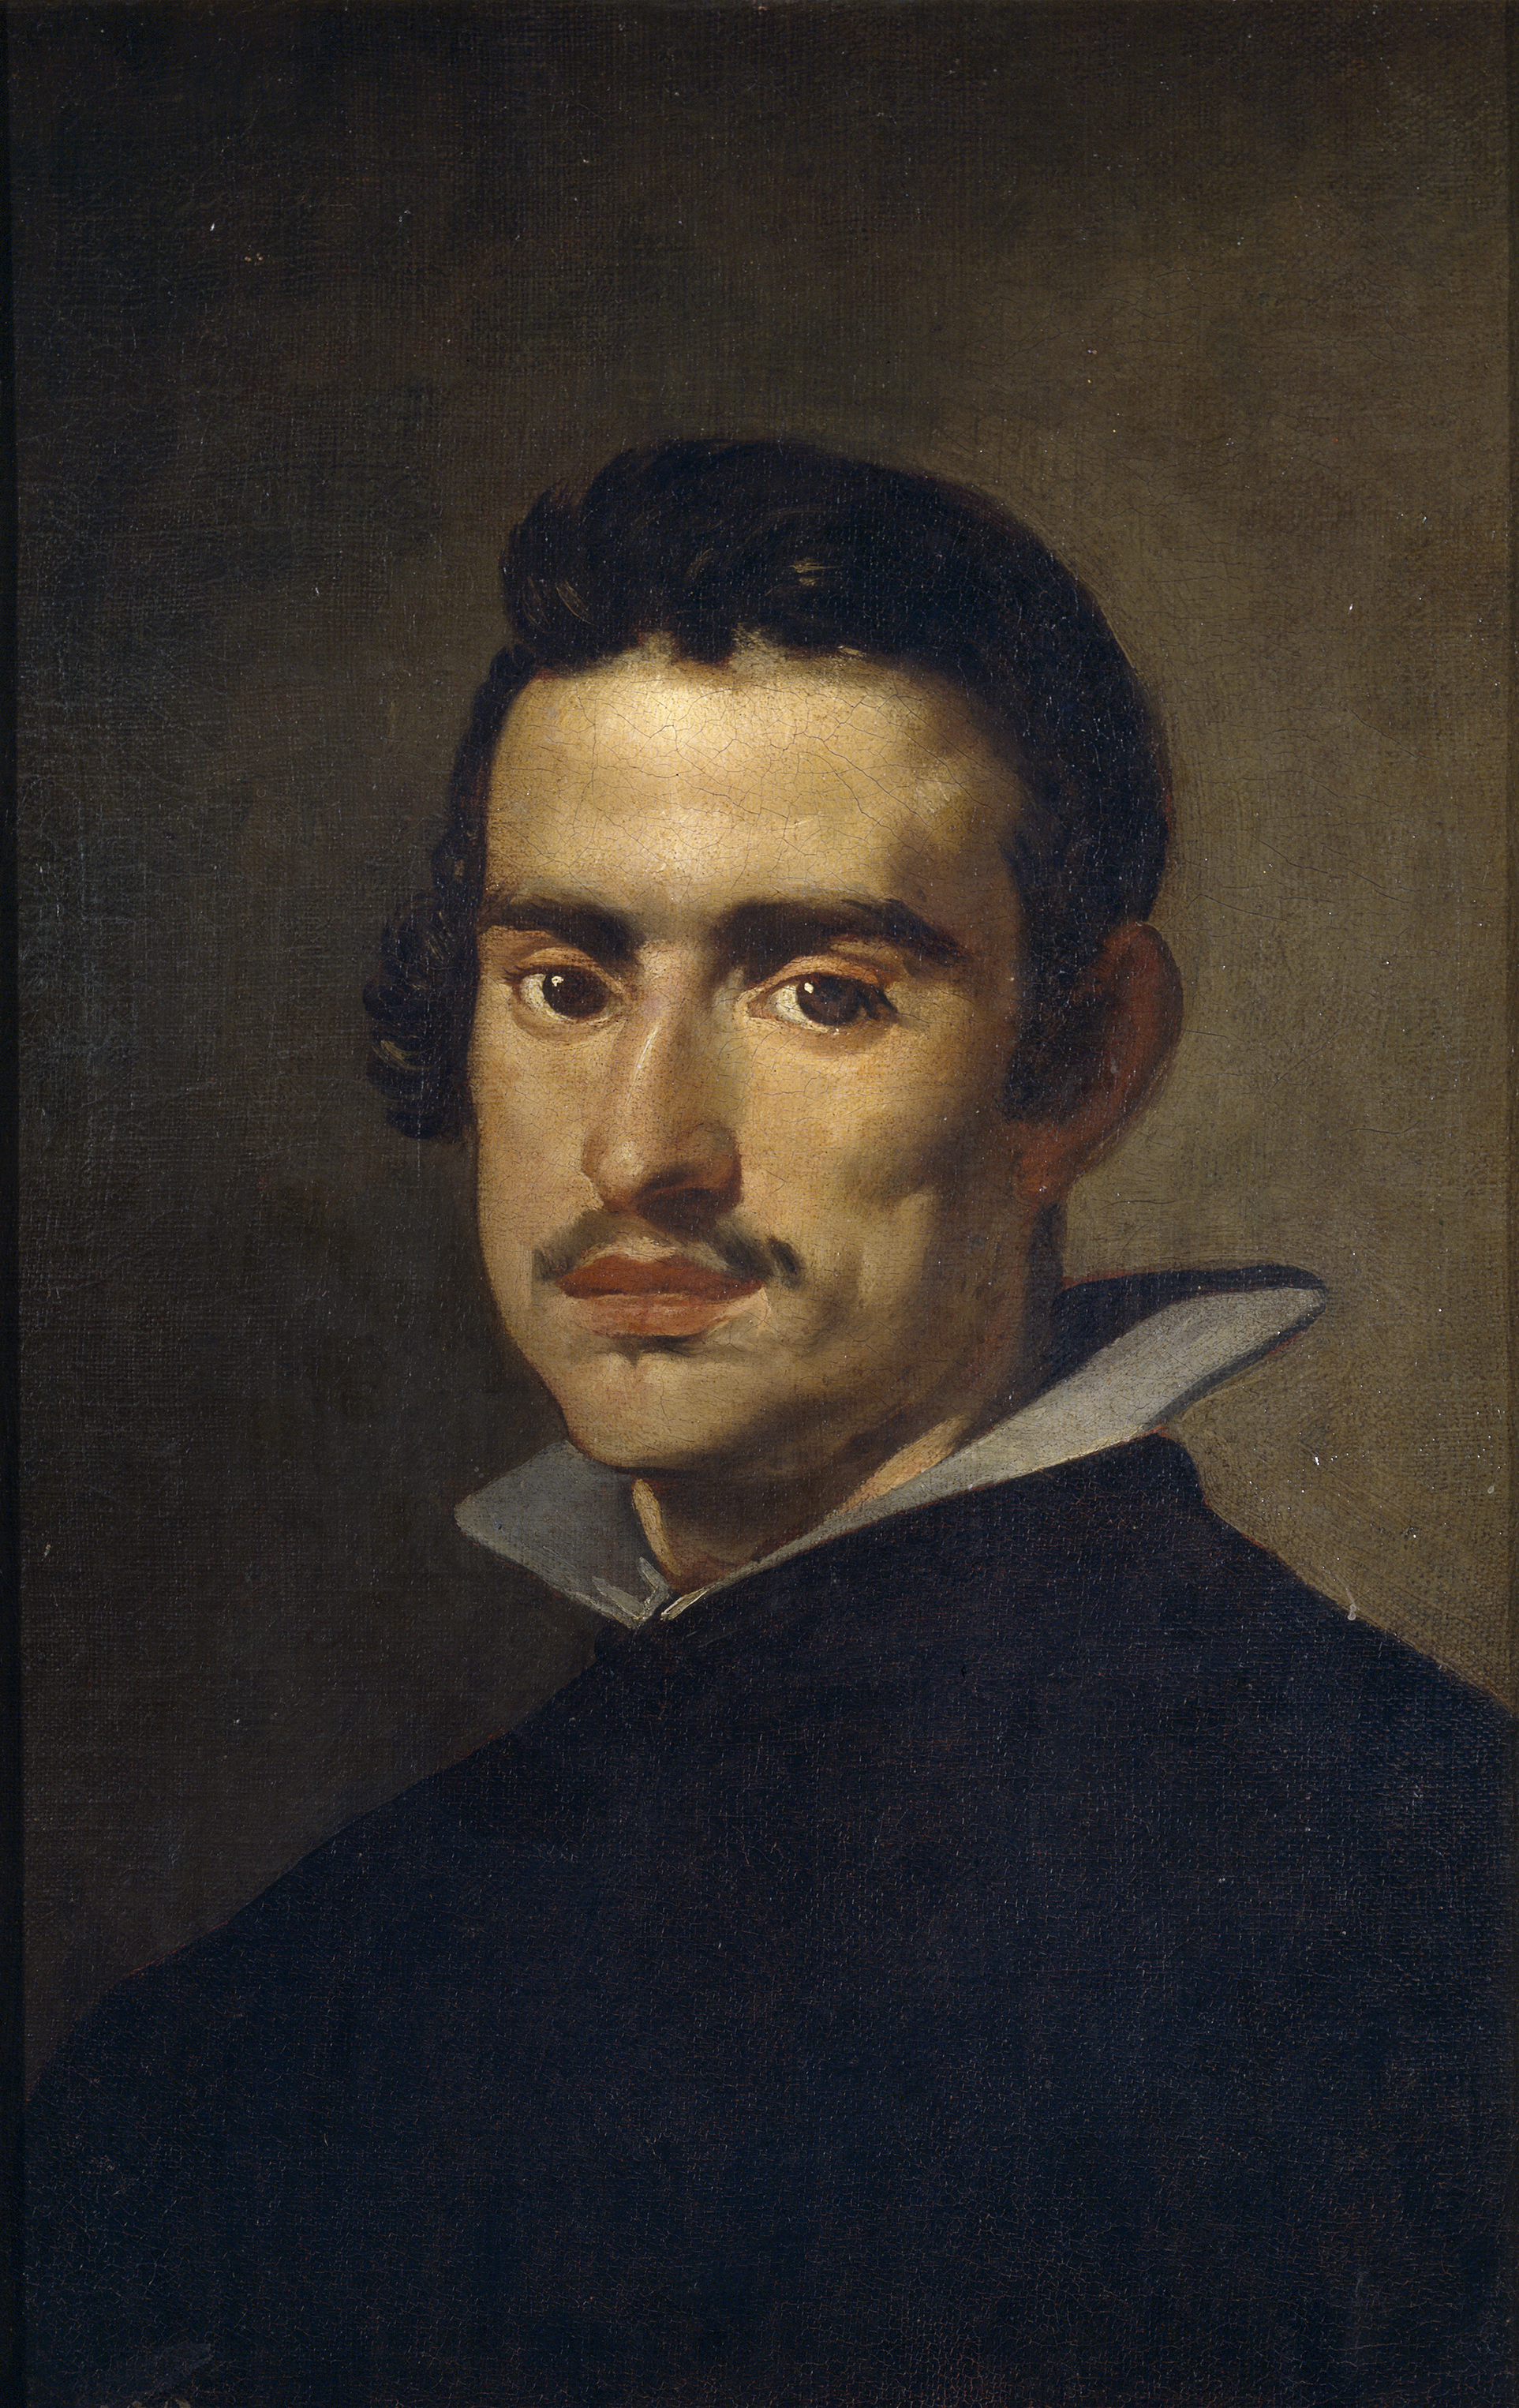 File:Retrato de hombre joven, by Diego Velázquez.jpg ...